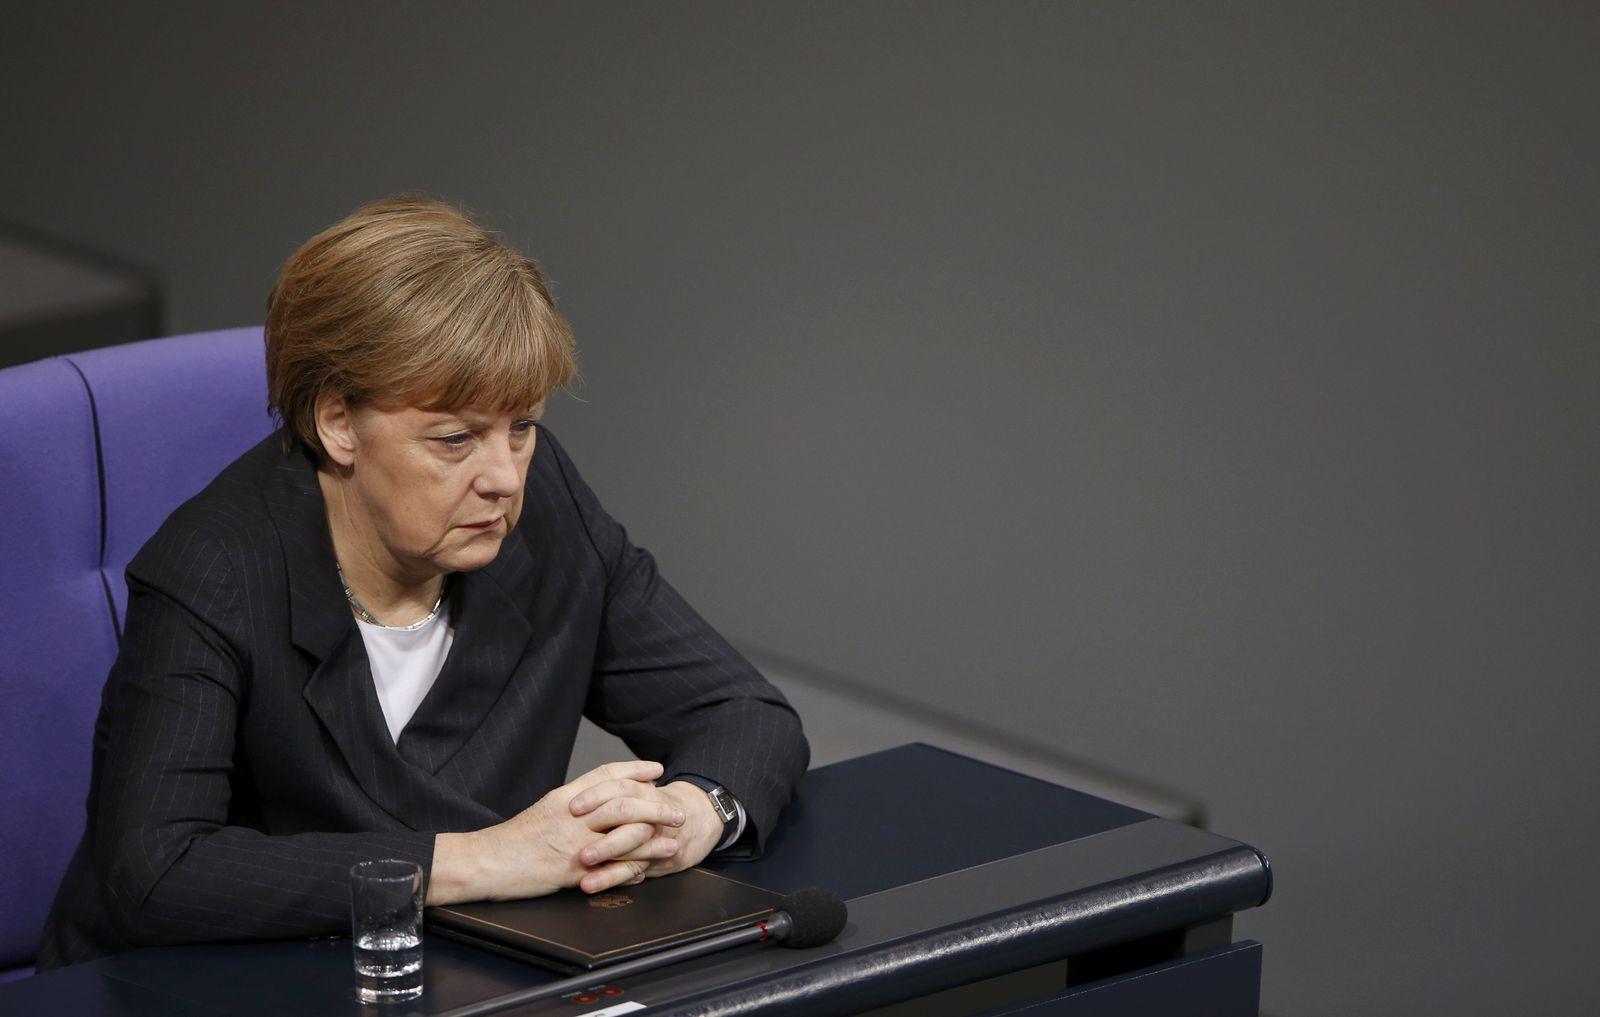 Angela Merkel/ Bundestag